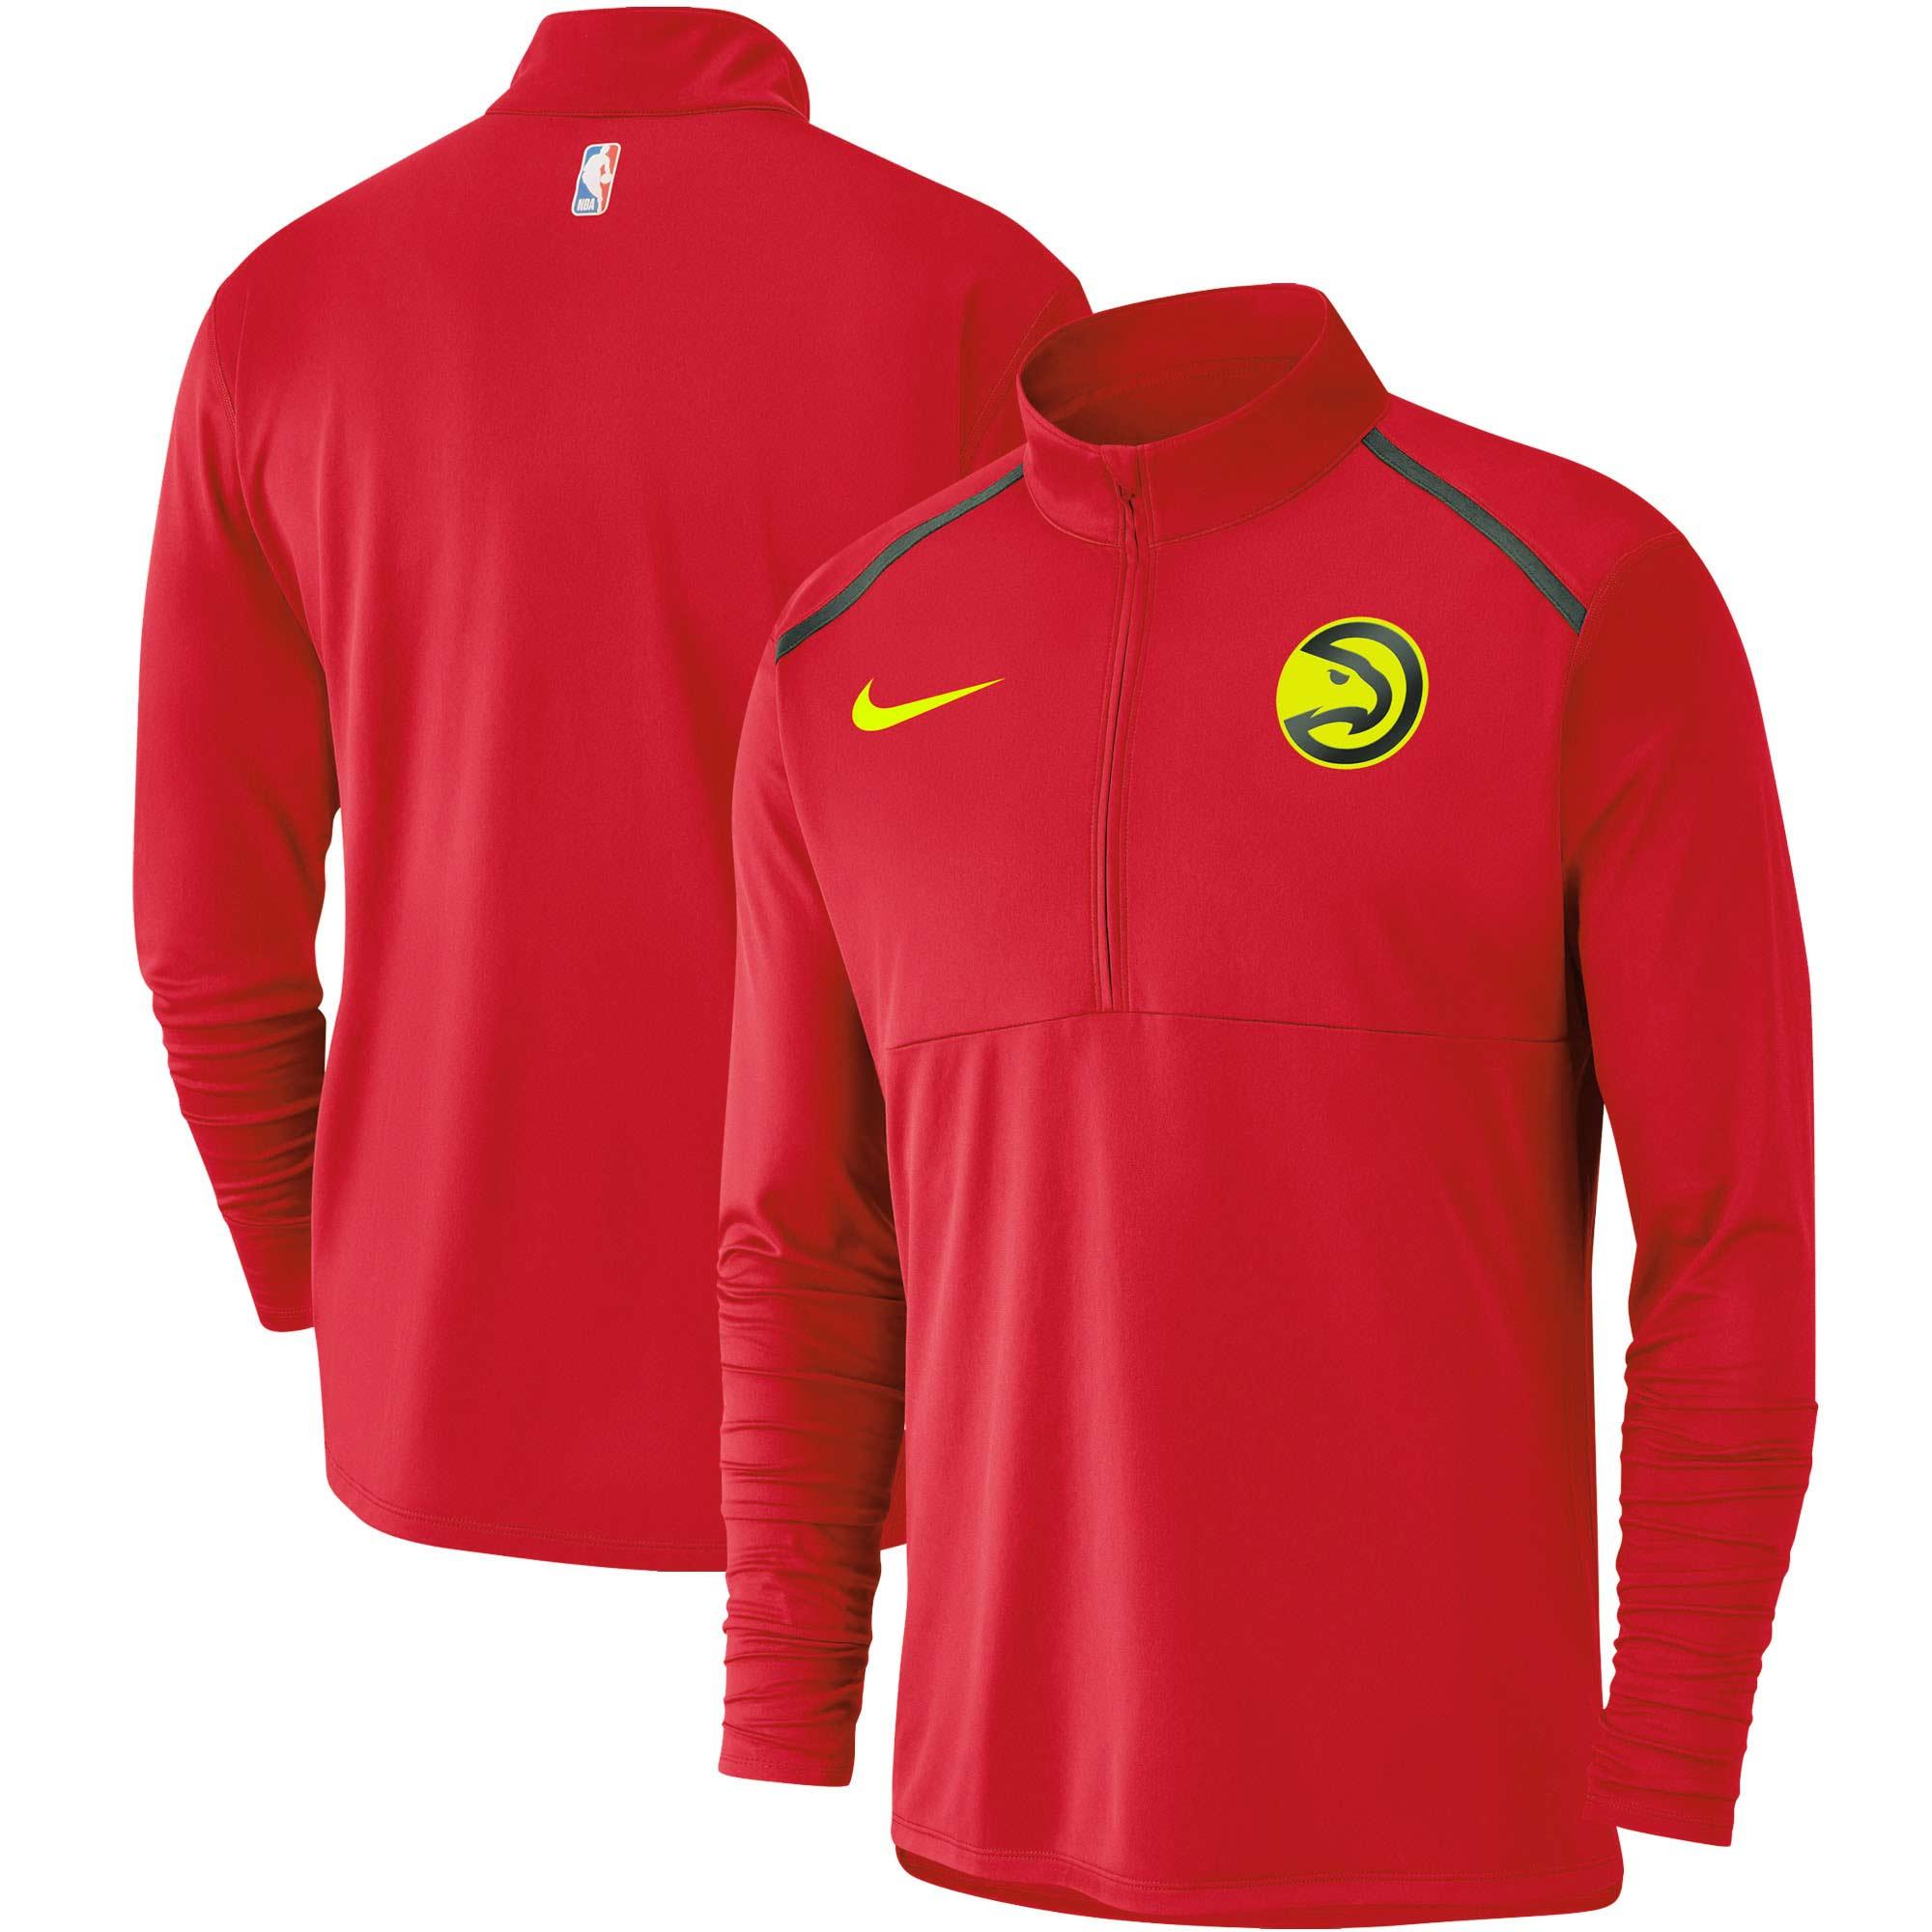 Atlanta Hawks Nike Element Performance Half-Zip Pullover Jacket - Red